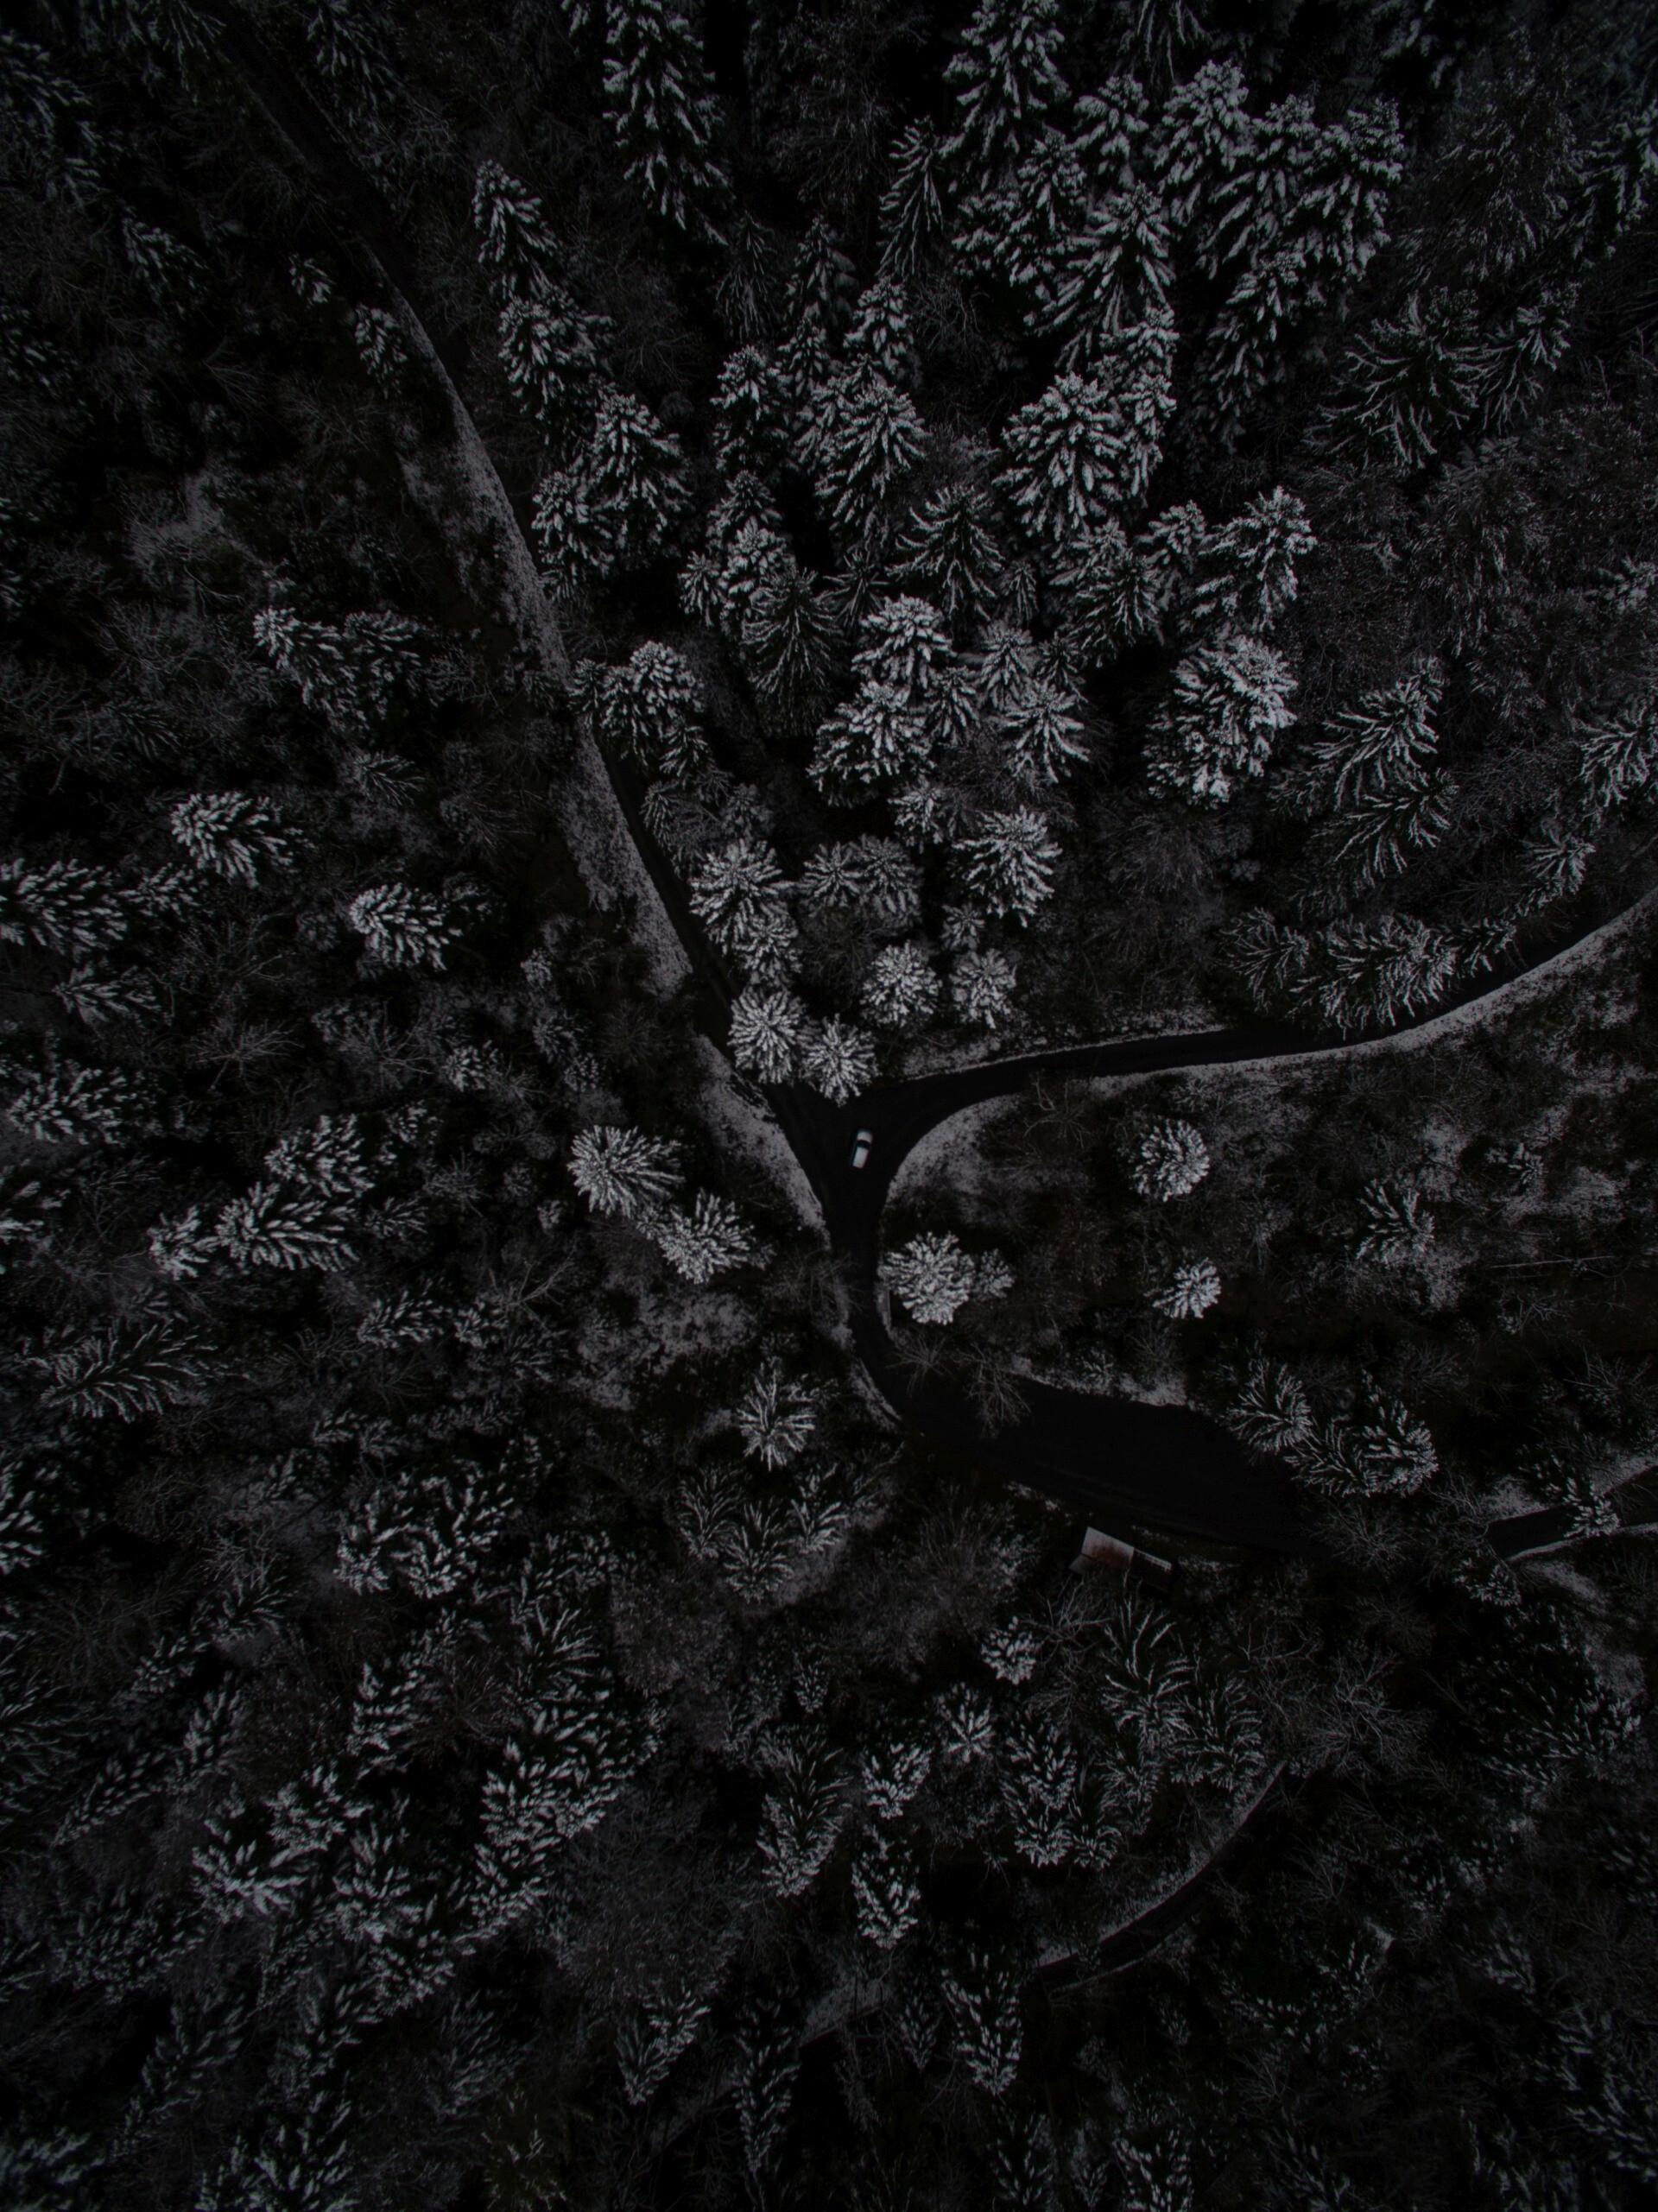 dark amoled wallpapers